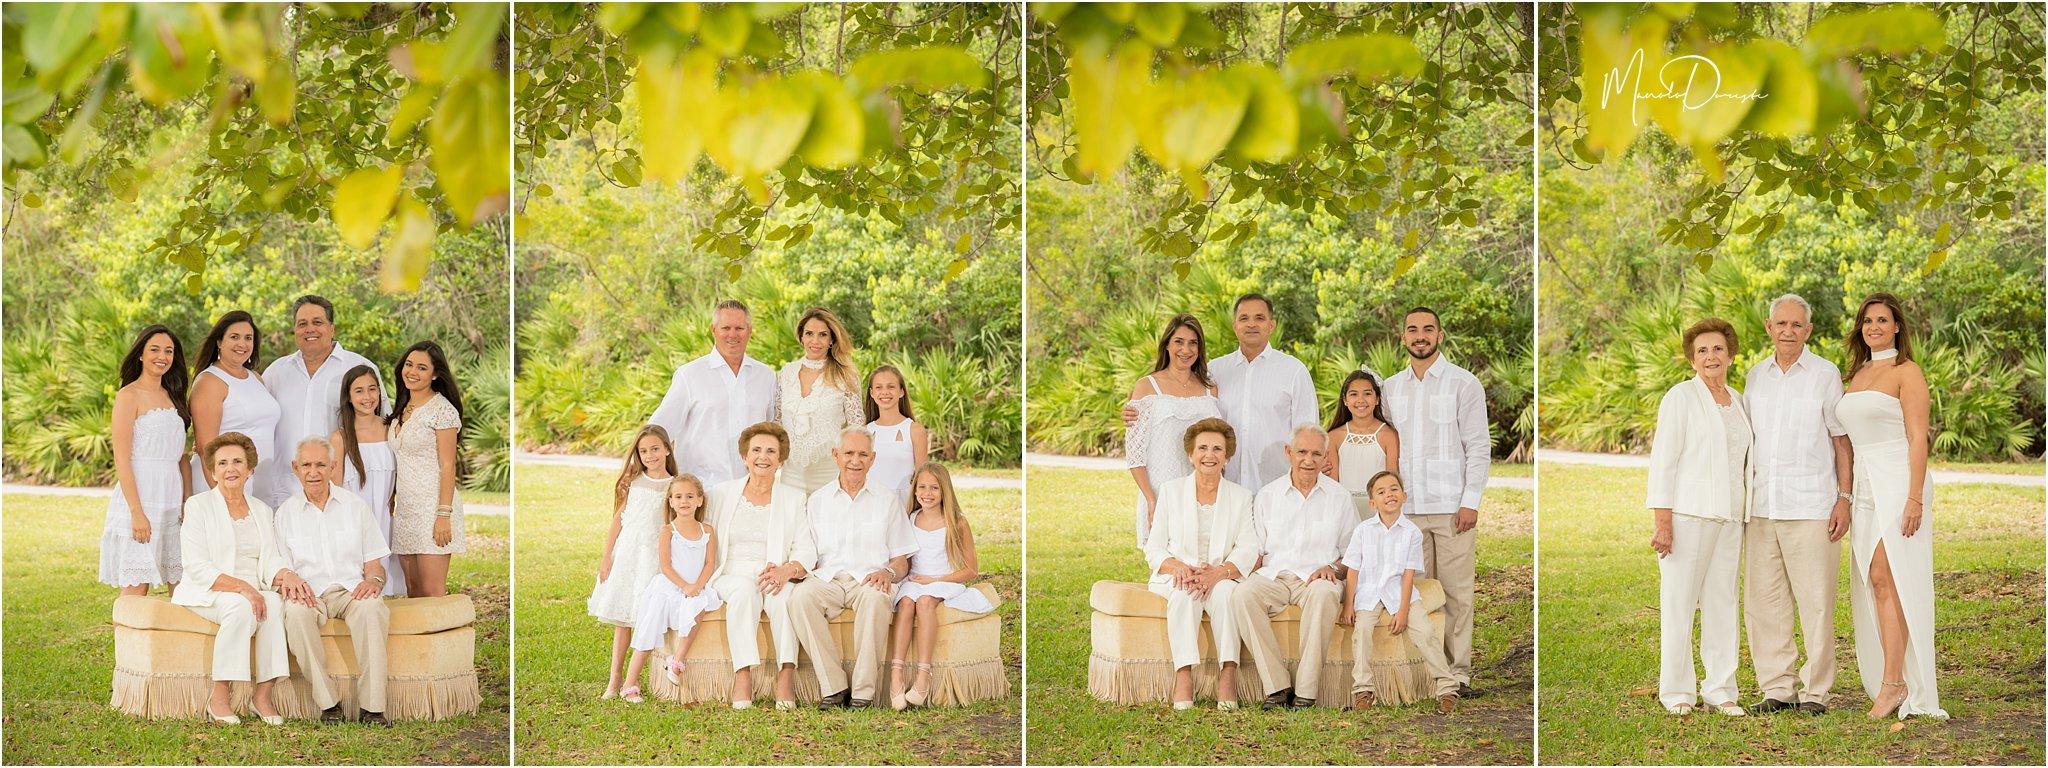 0555_ManoloDoreste_InFocusStudios_Wedding_Family_Photography_Miami_MiamiPhotographer.jpg